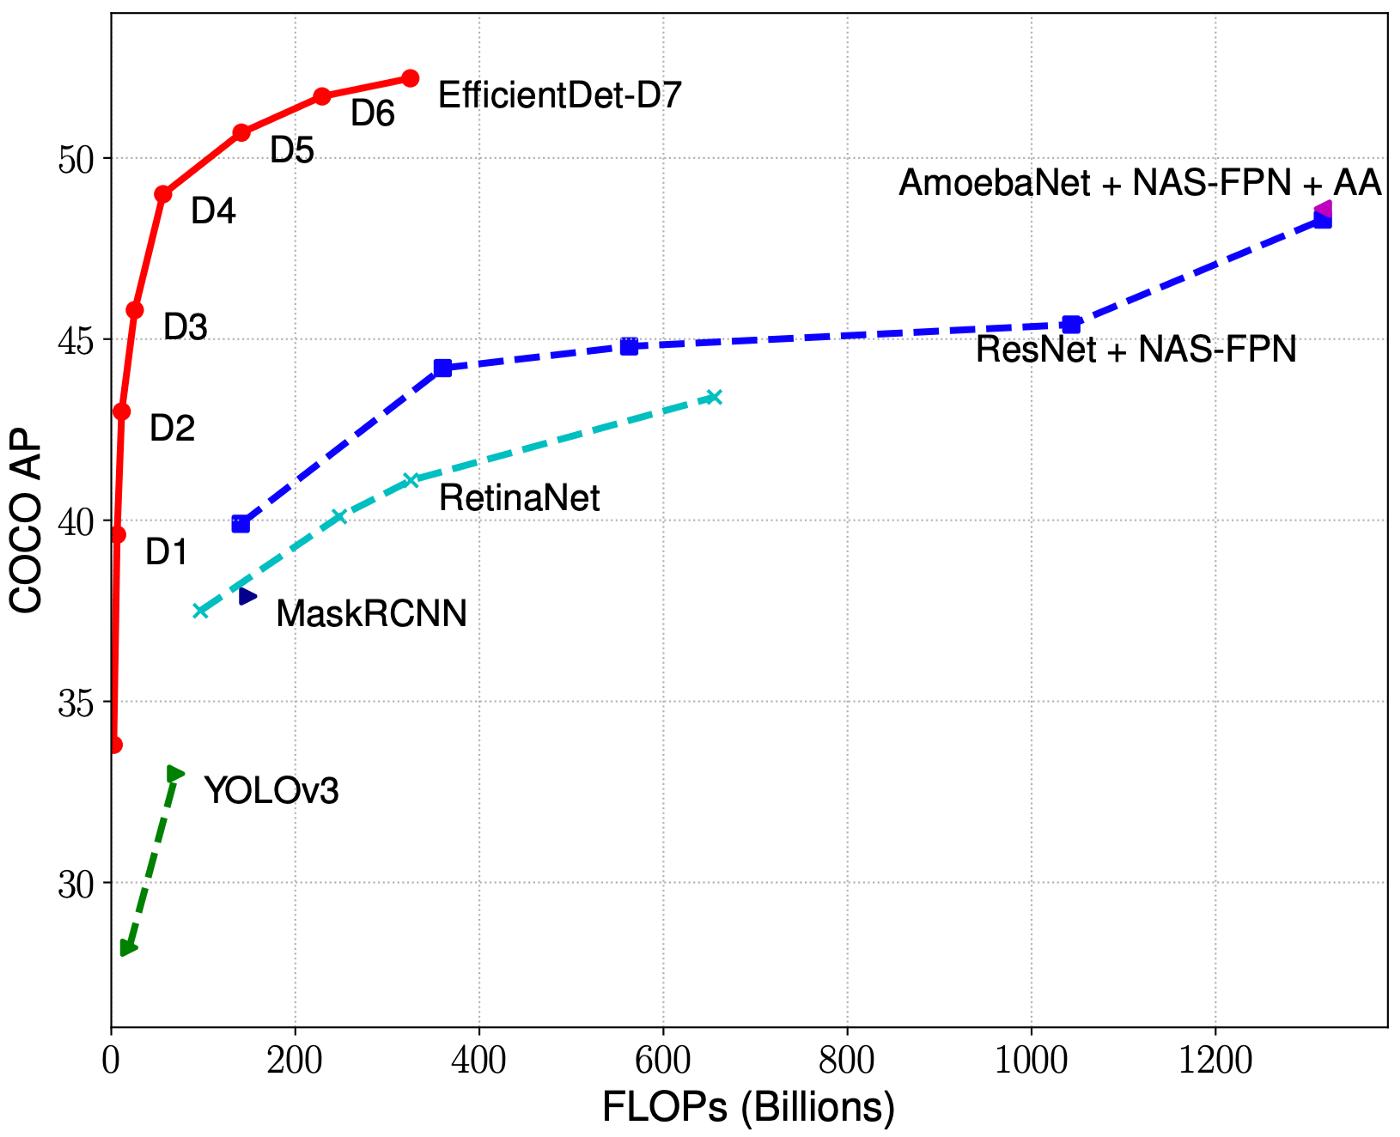 COCO AP vs Billion FLOPs for common neural networks.